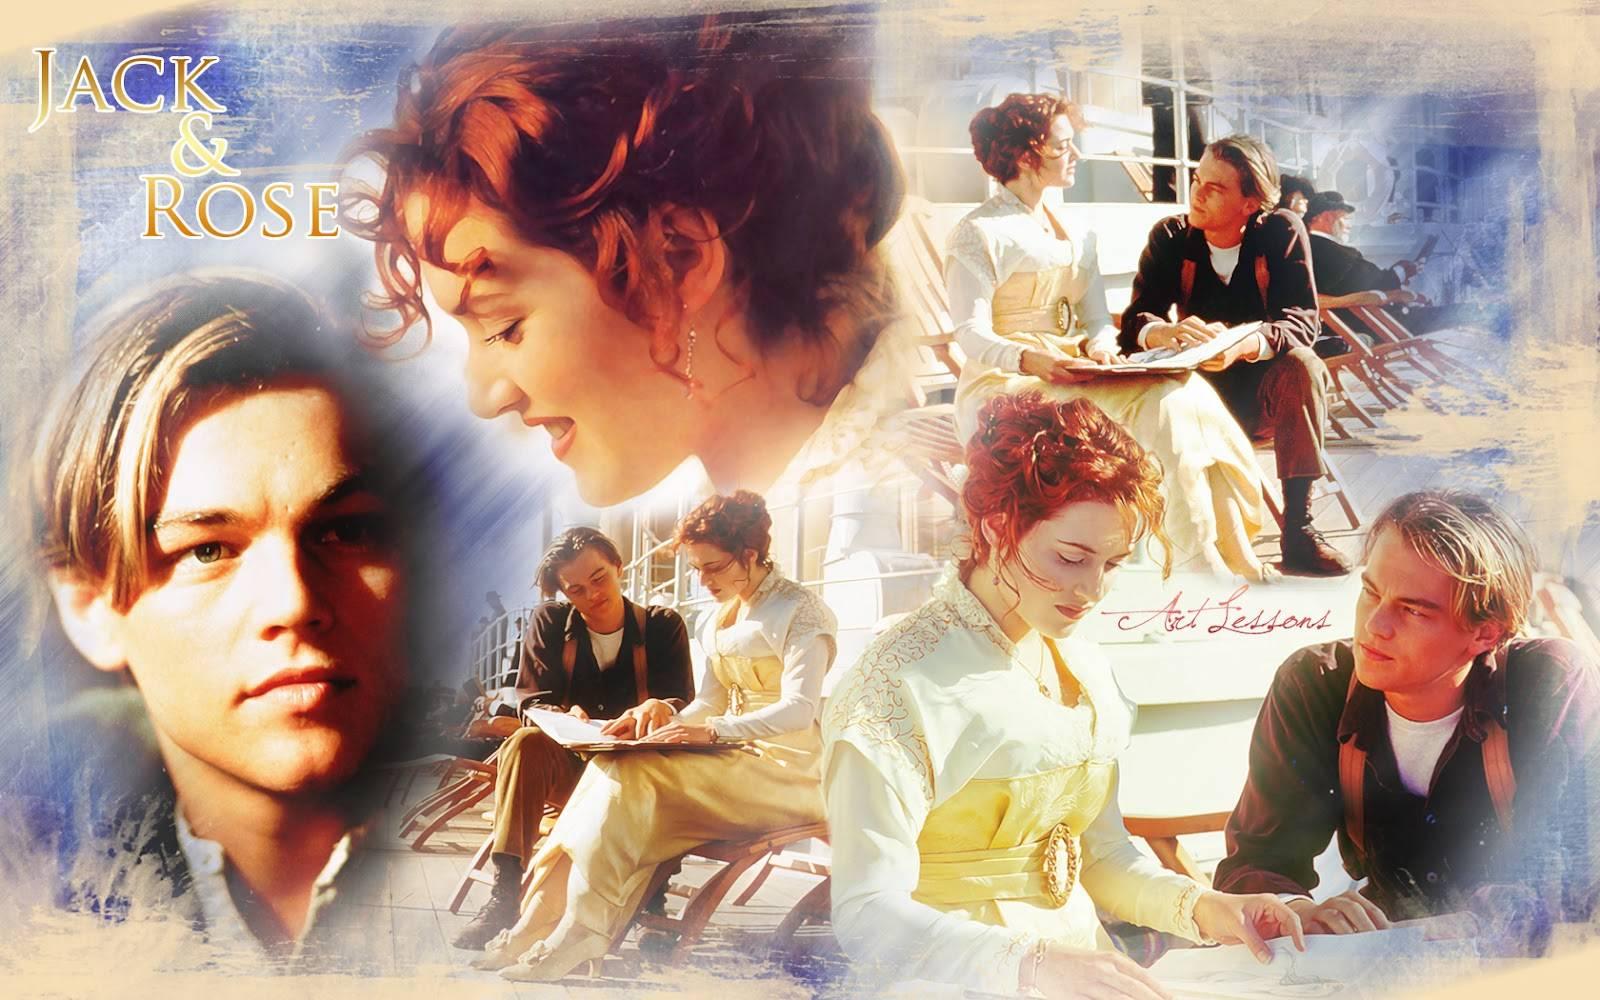 Jack & Rose Wallpaper, A Wallpaper of Jack and Rose